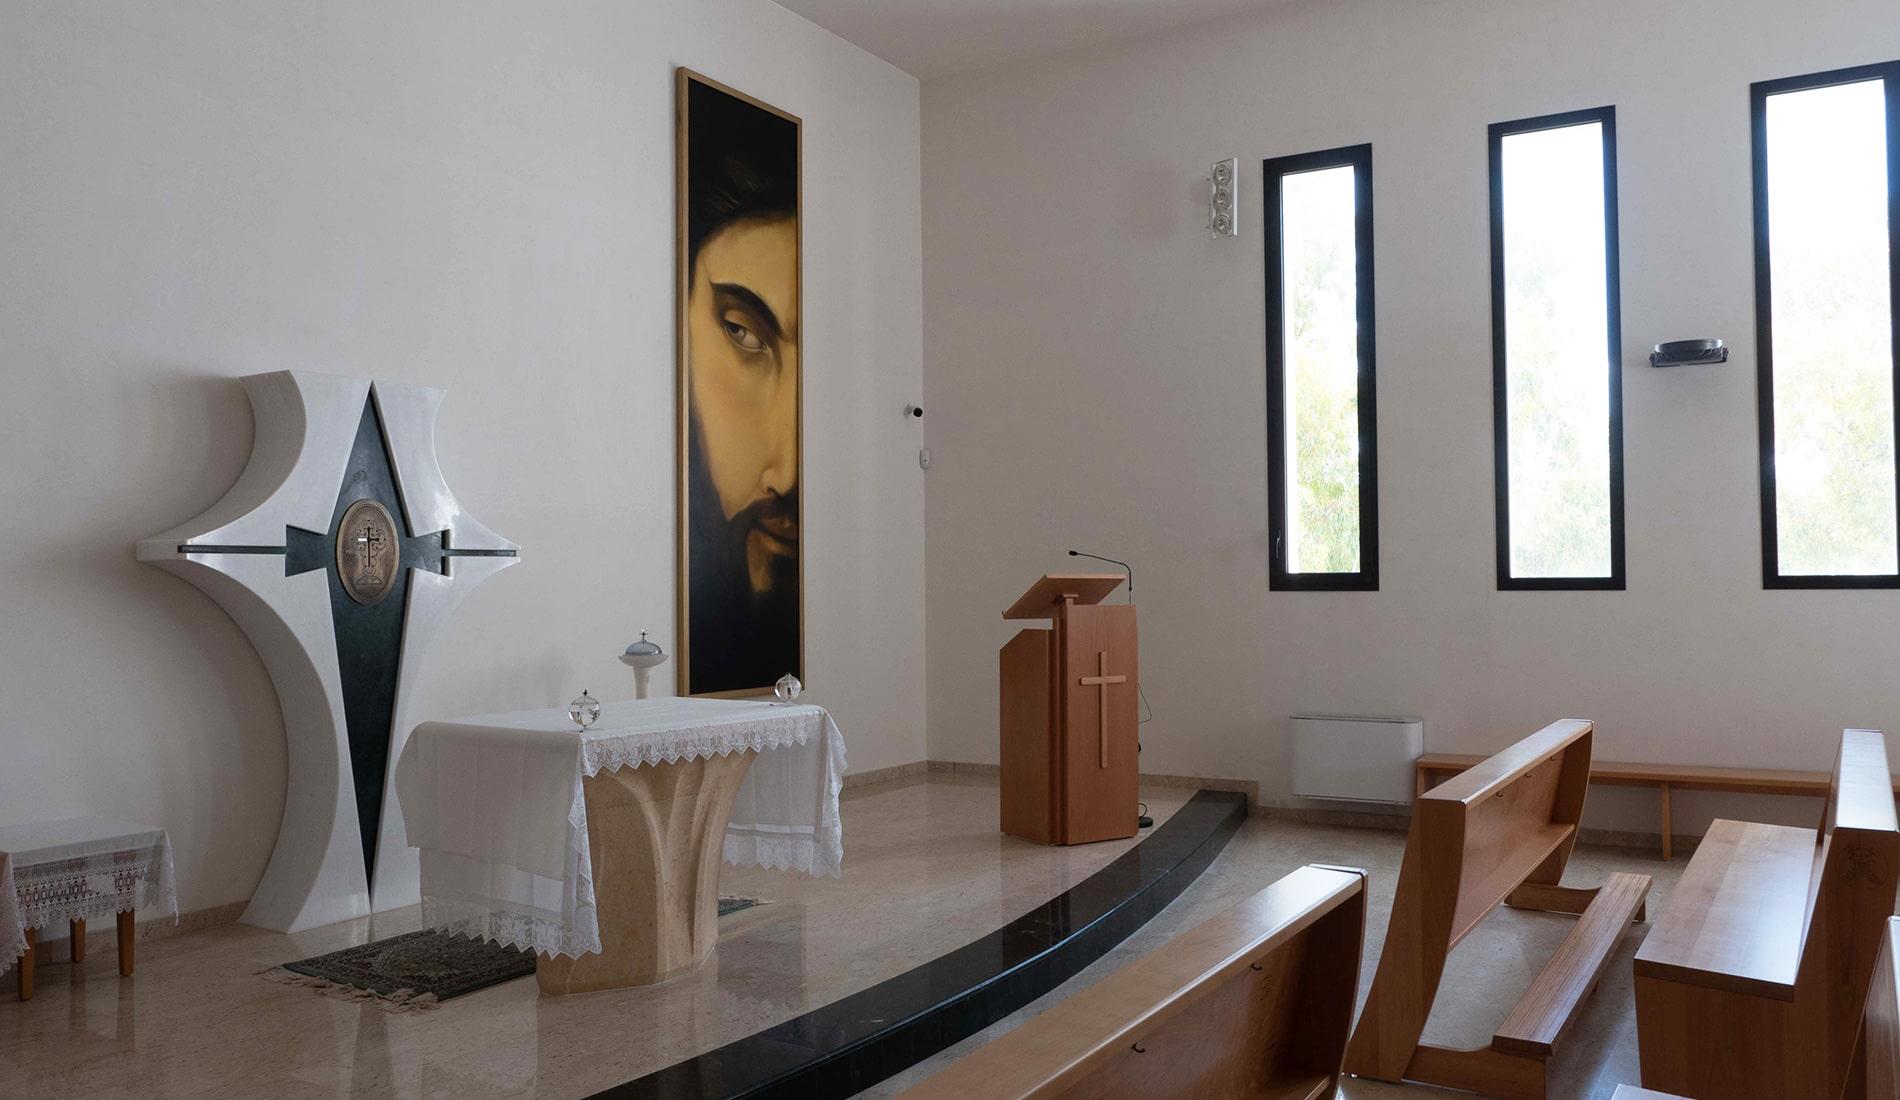 marmi-strada-villa-castelli-brindisi-marmi-graniti-mosaici-arte-sacra-architettura-chiese-4